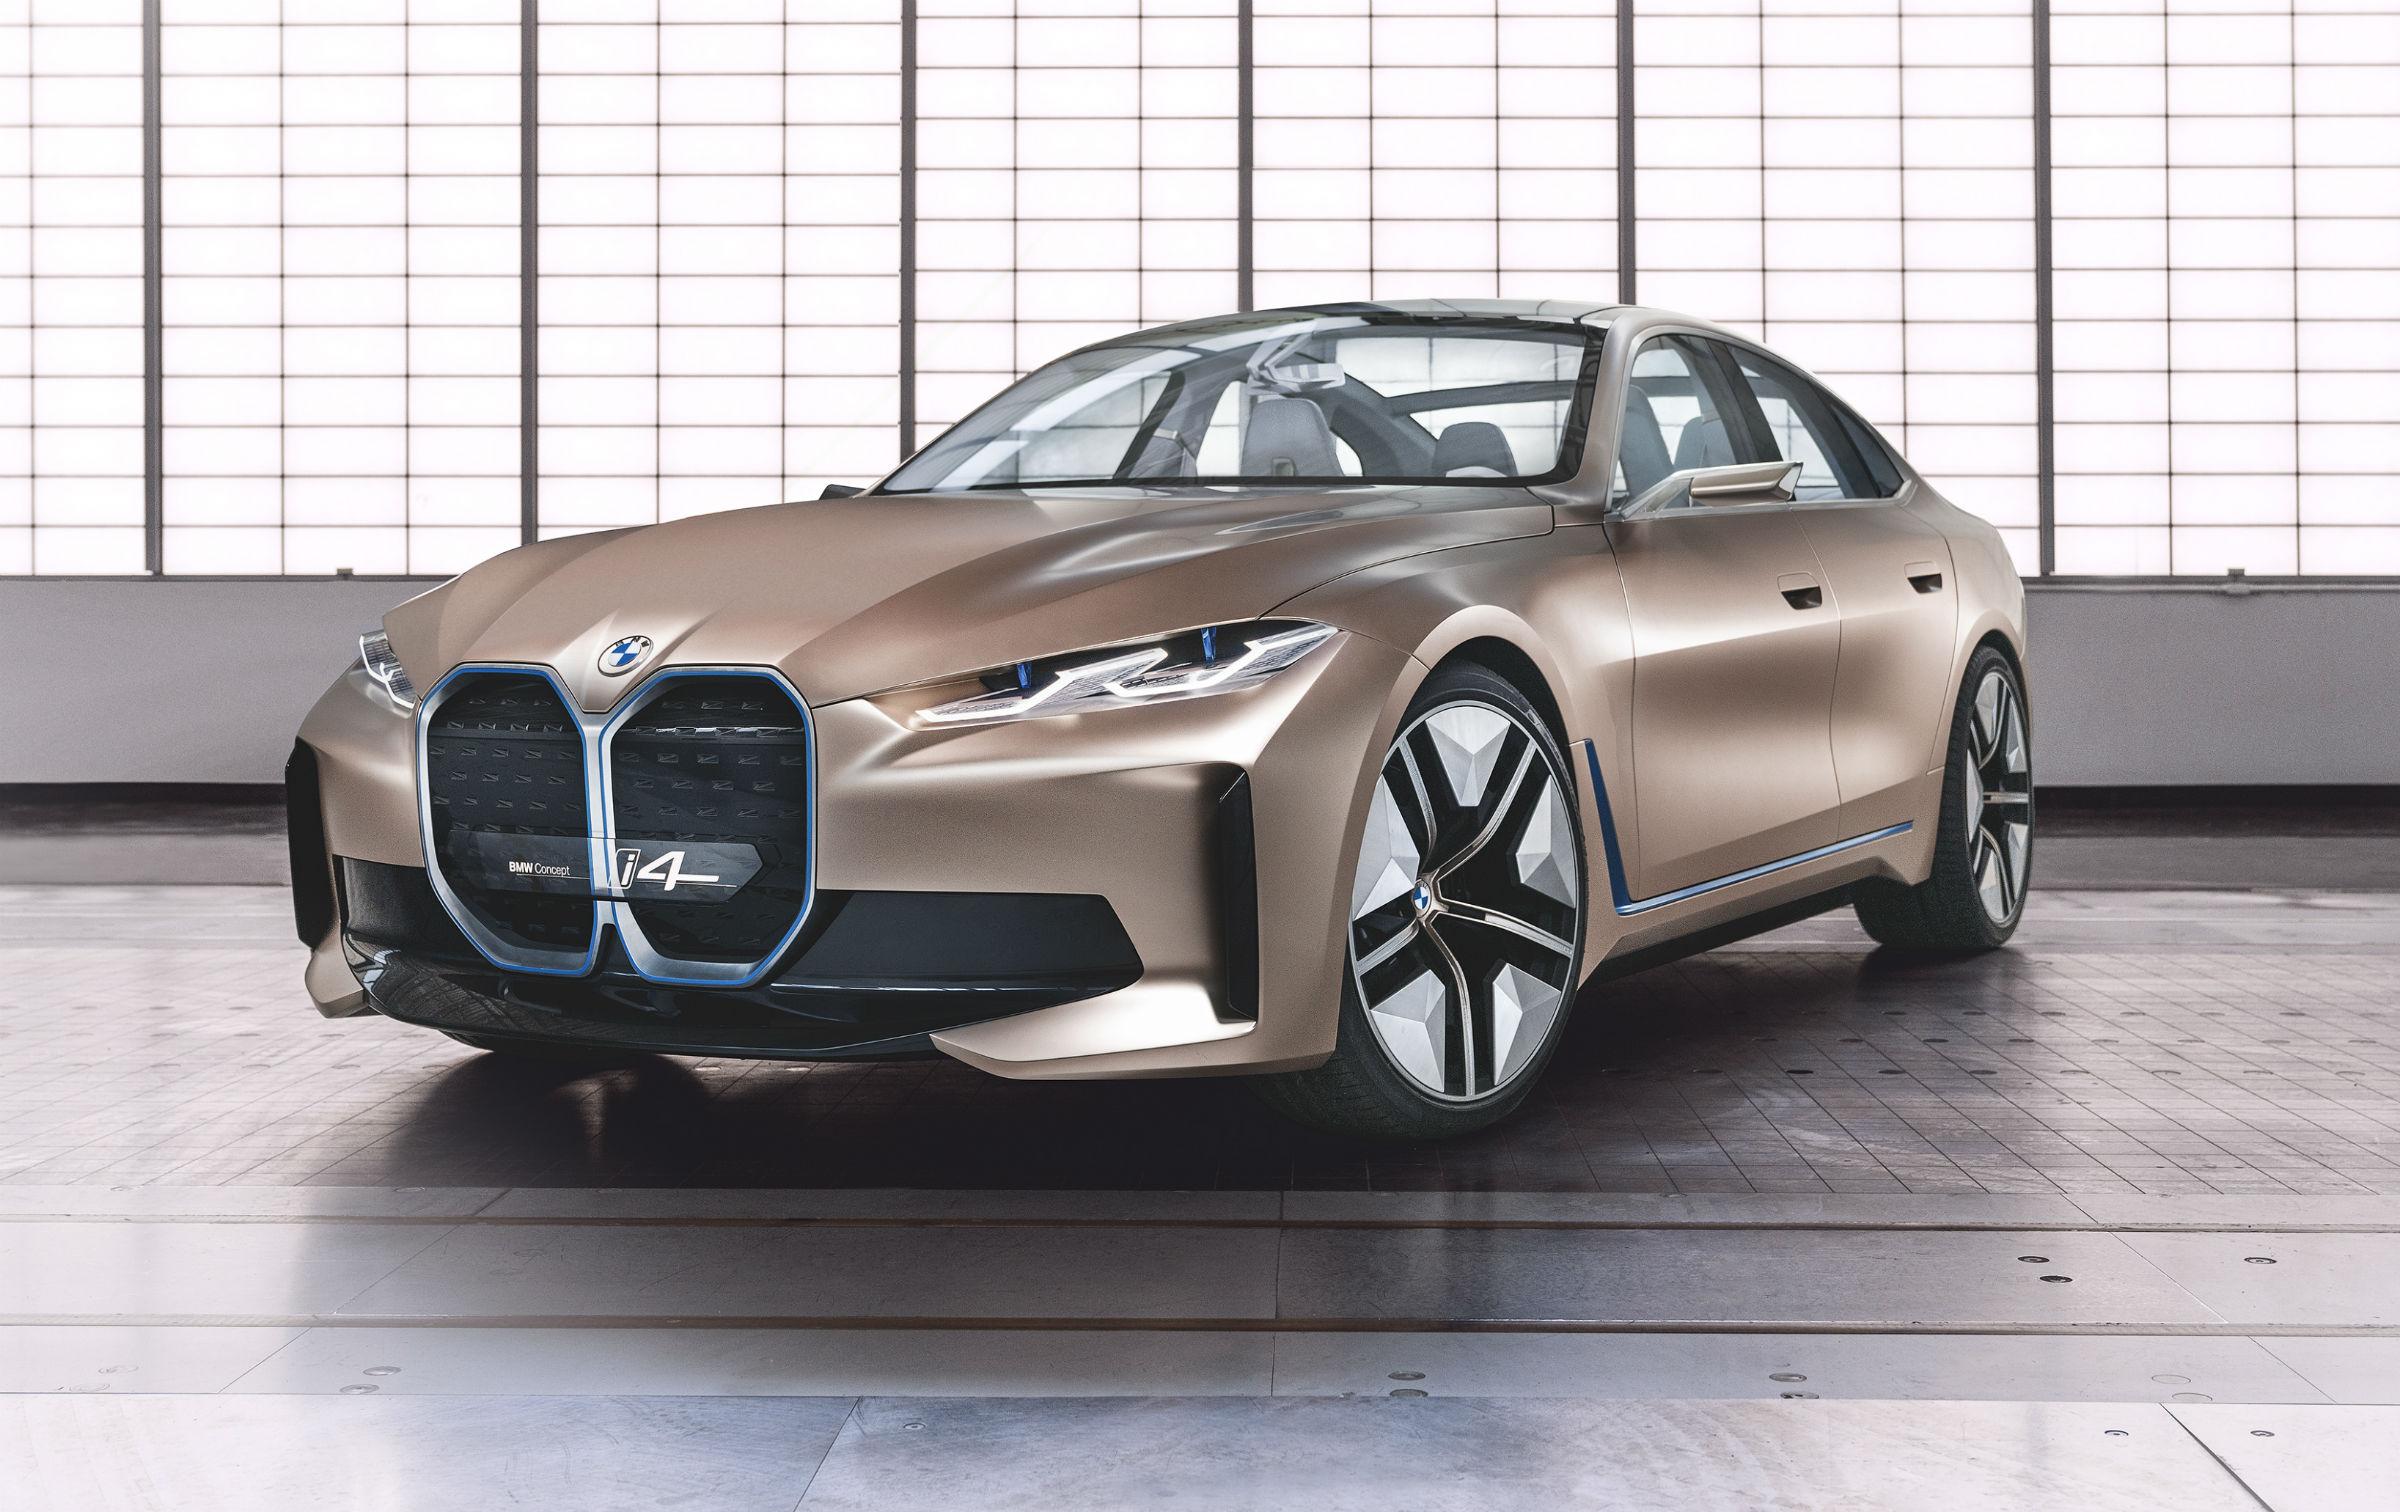 BMW Concept i4 bmw 4 2020